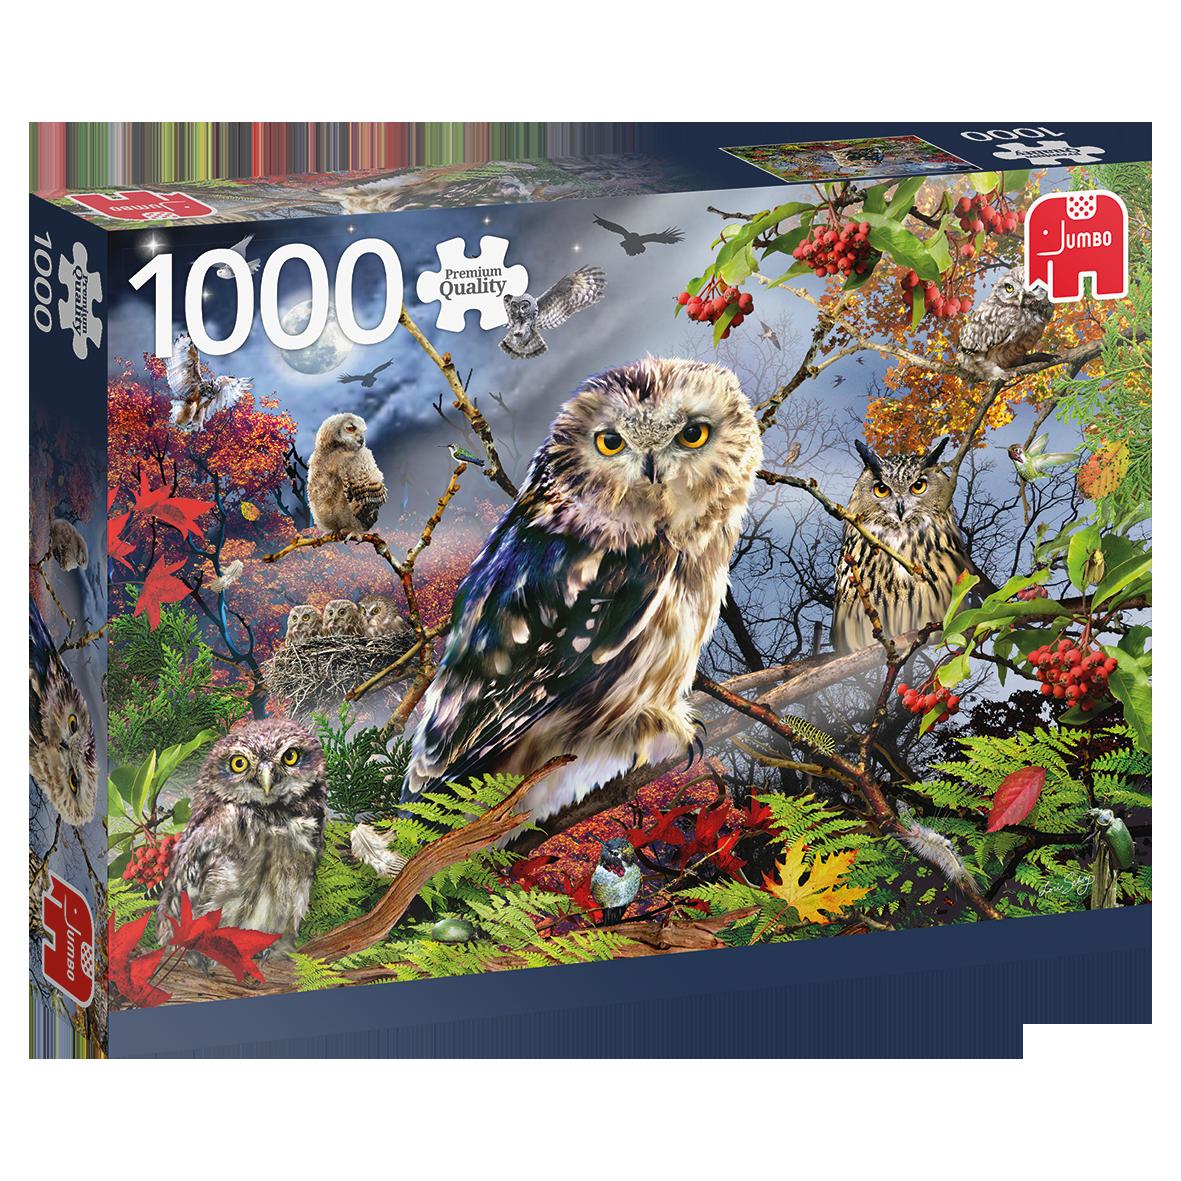 Jumbo 1000 pzs. PC Owls in the Moonlight